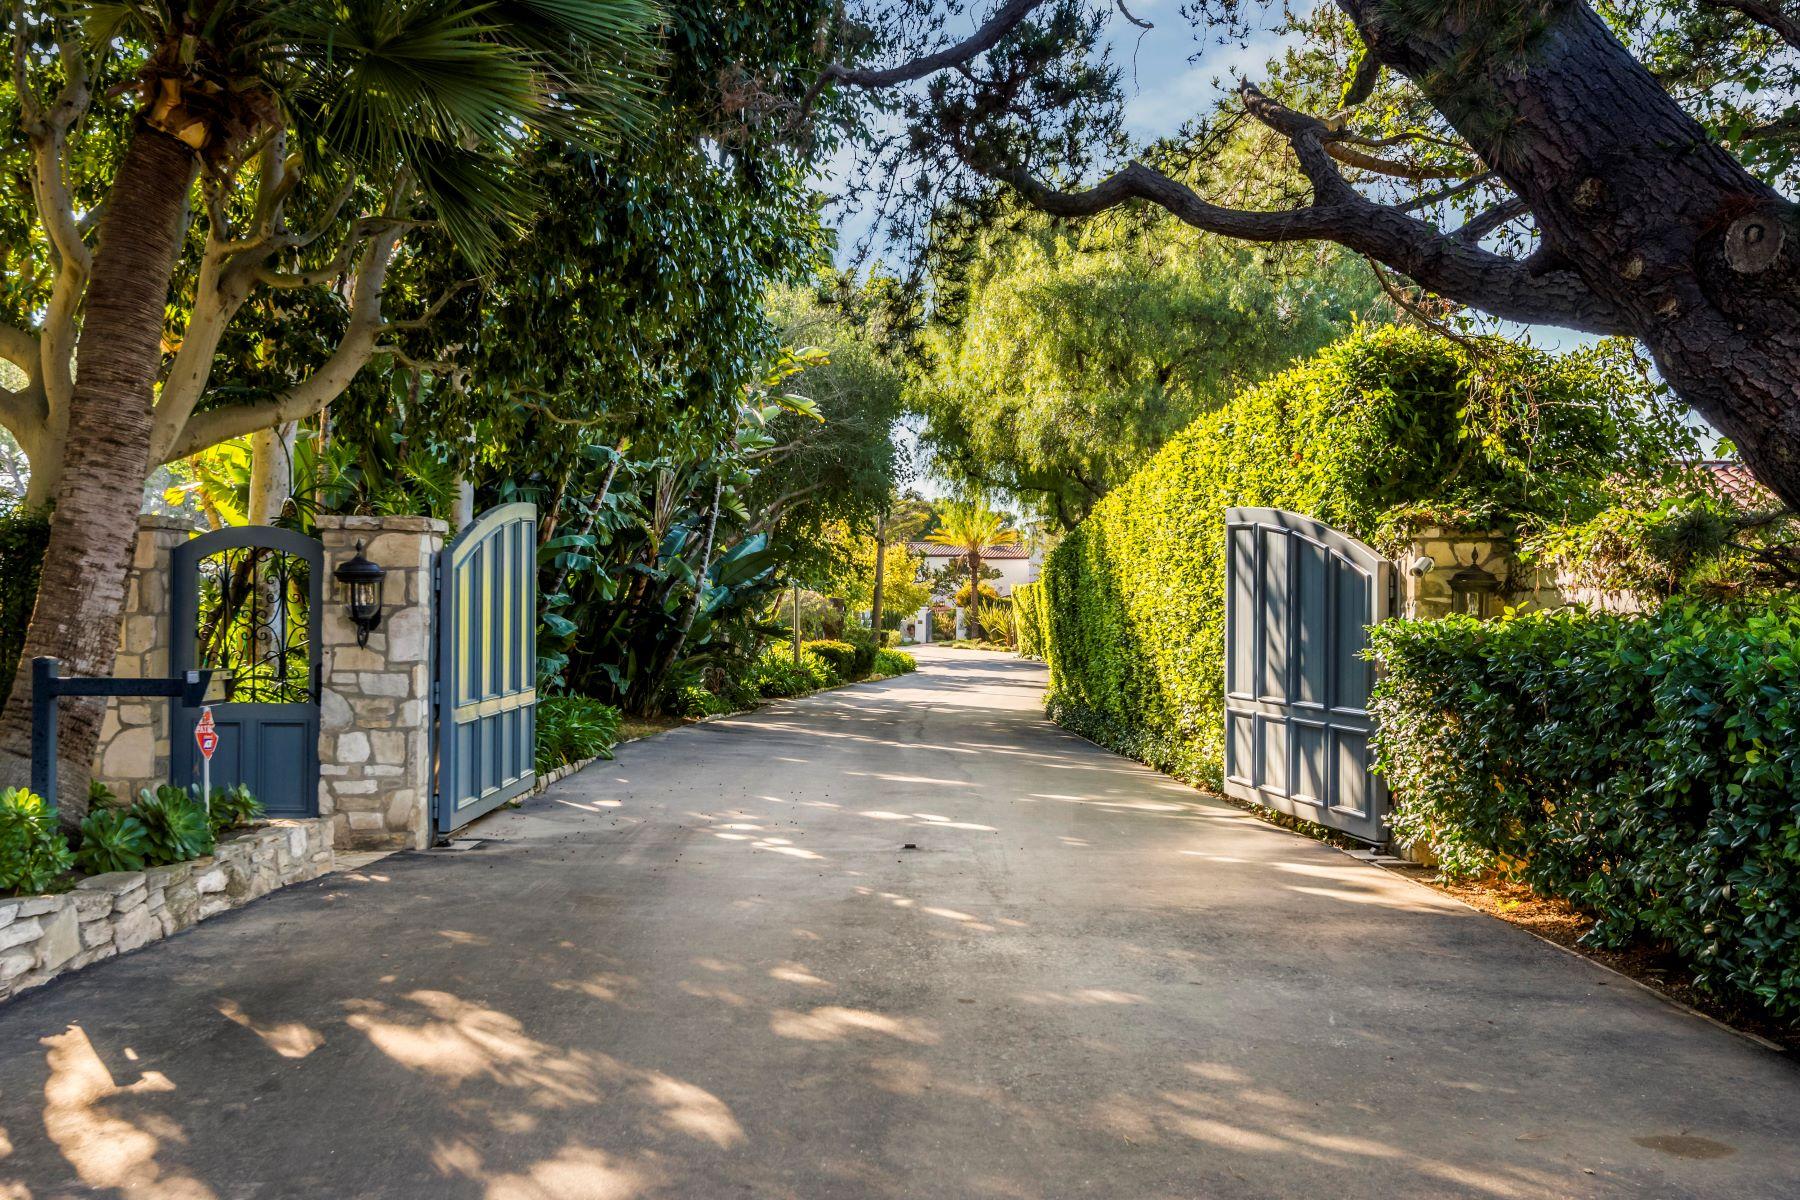 Additional photo for property listing at 909 Via Coronel, Palos Verdes Estates, CA 90274 909 Via Coronel Palos Verdes Estates, California 90274 Estados Unidos